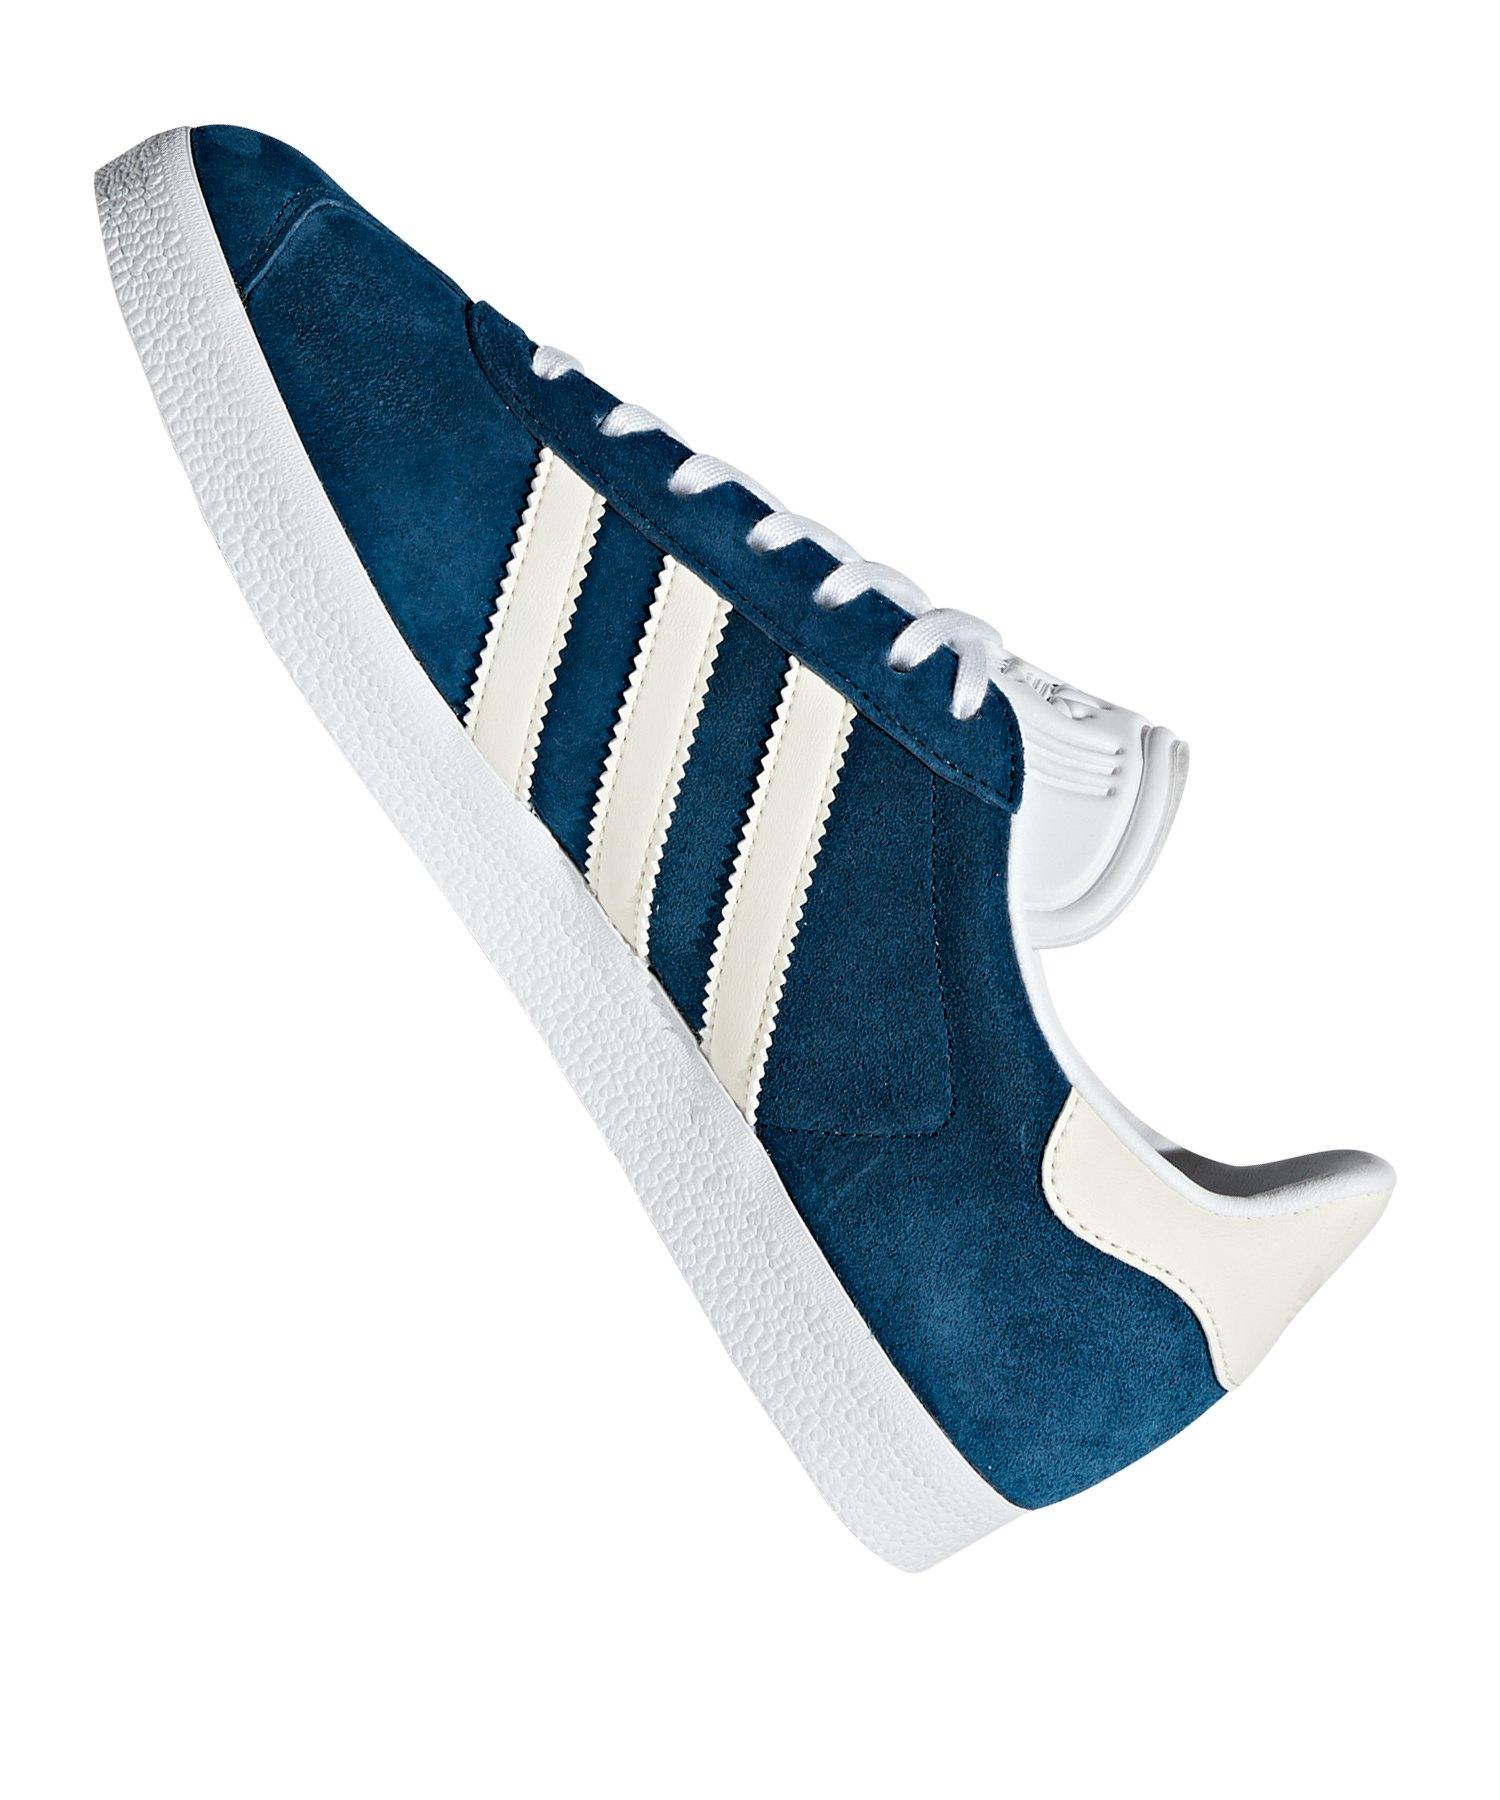 adidas Originals Gazelle Sneaker Damen Blau Weiss